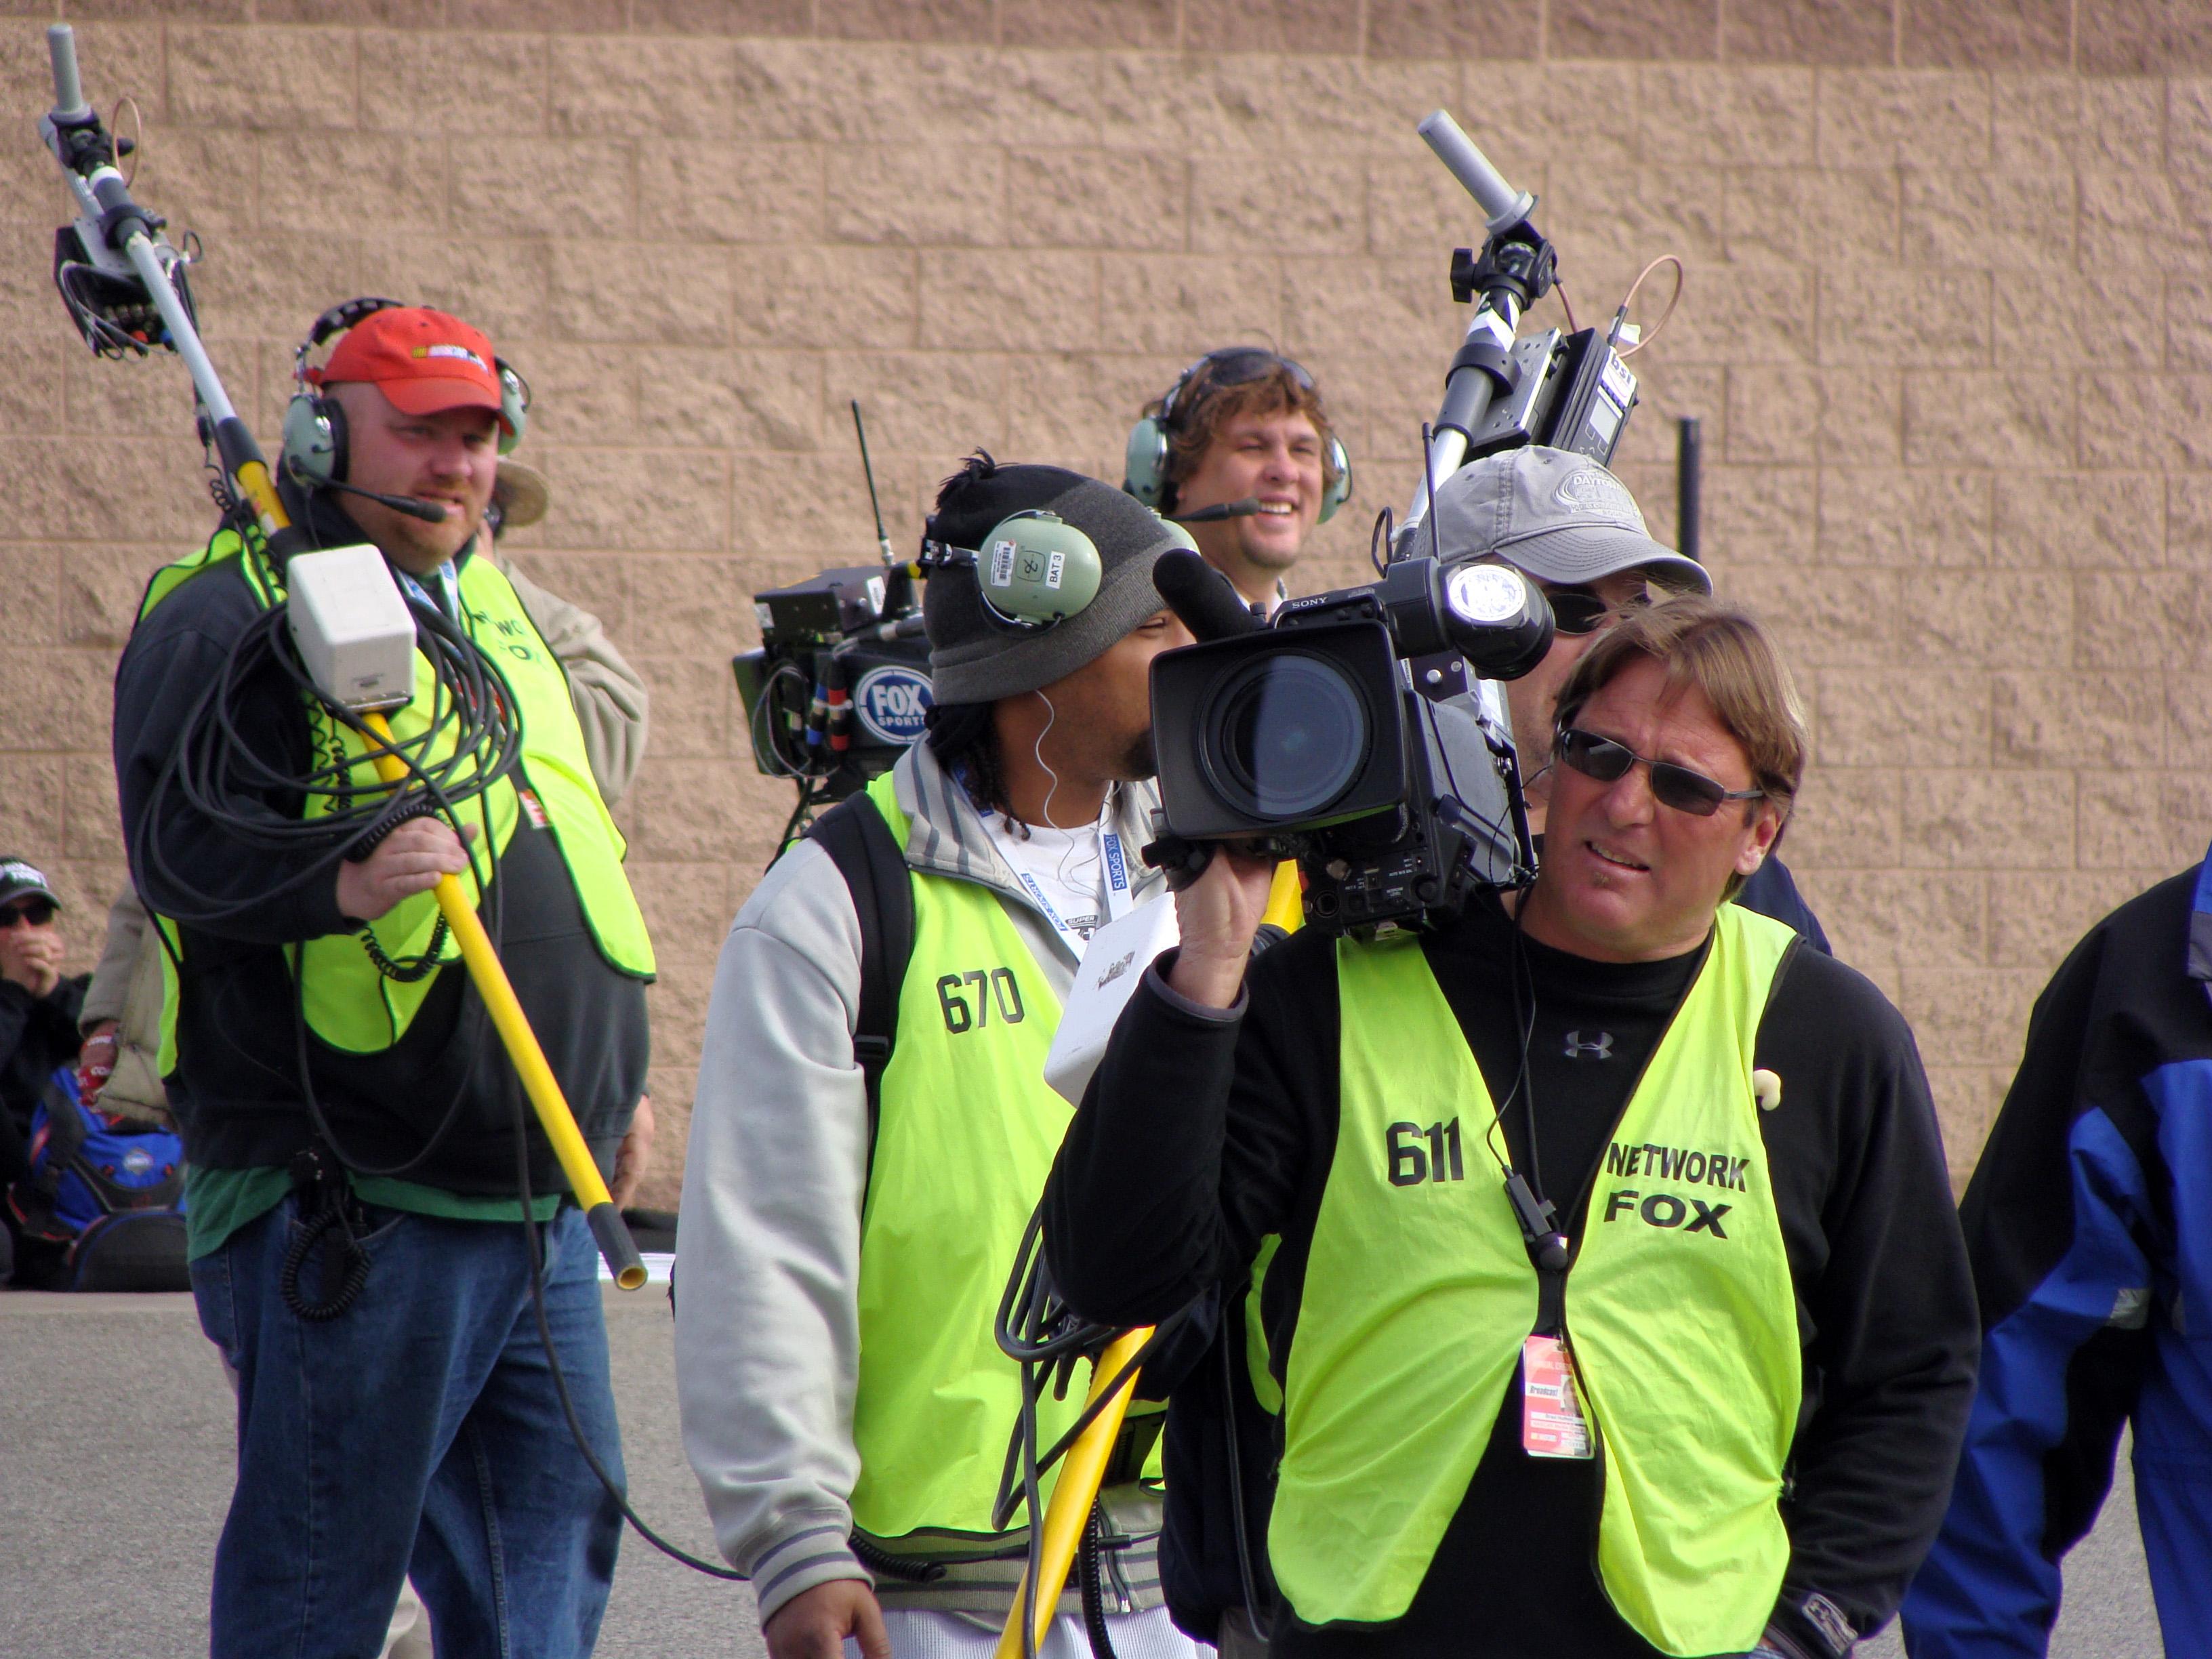 File:Fox Sports Camera Crew at ACS.JPG - Wikimedia Commons